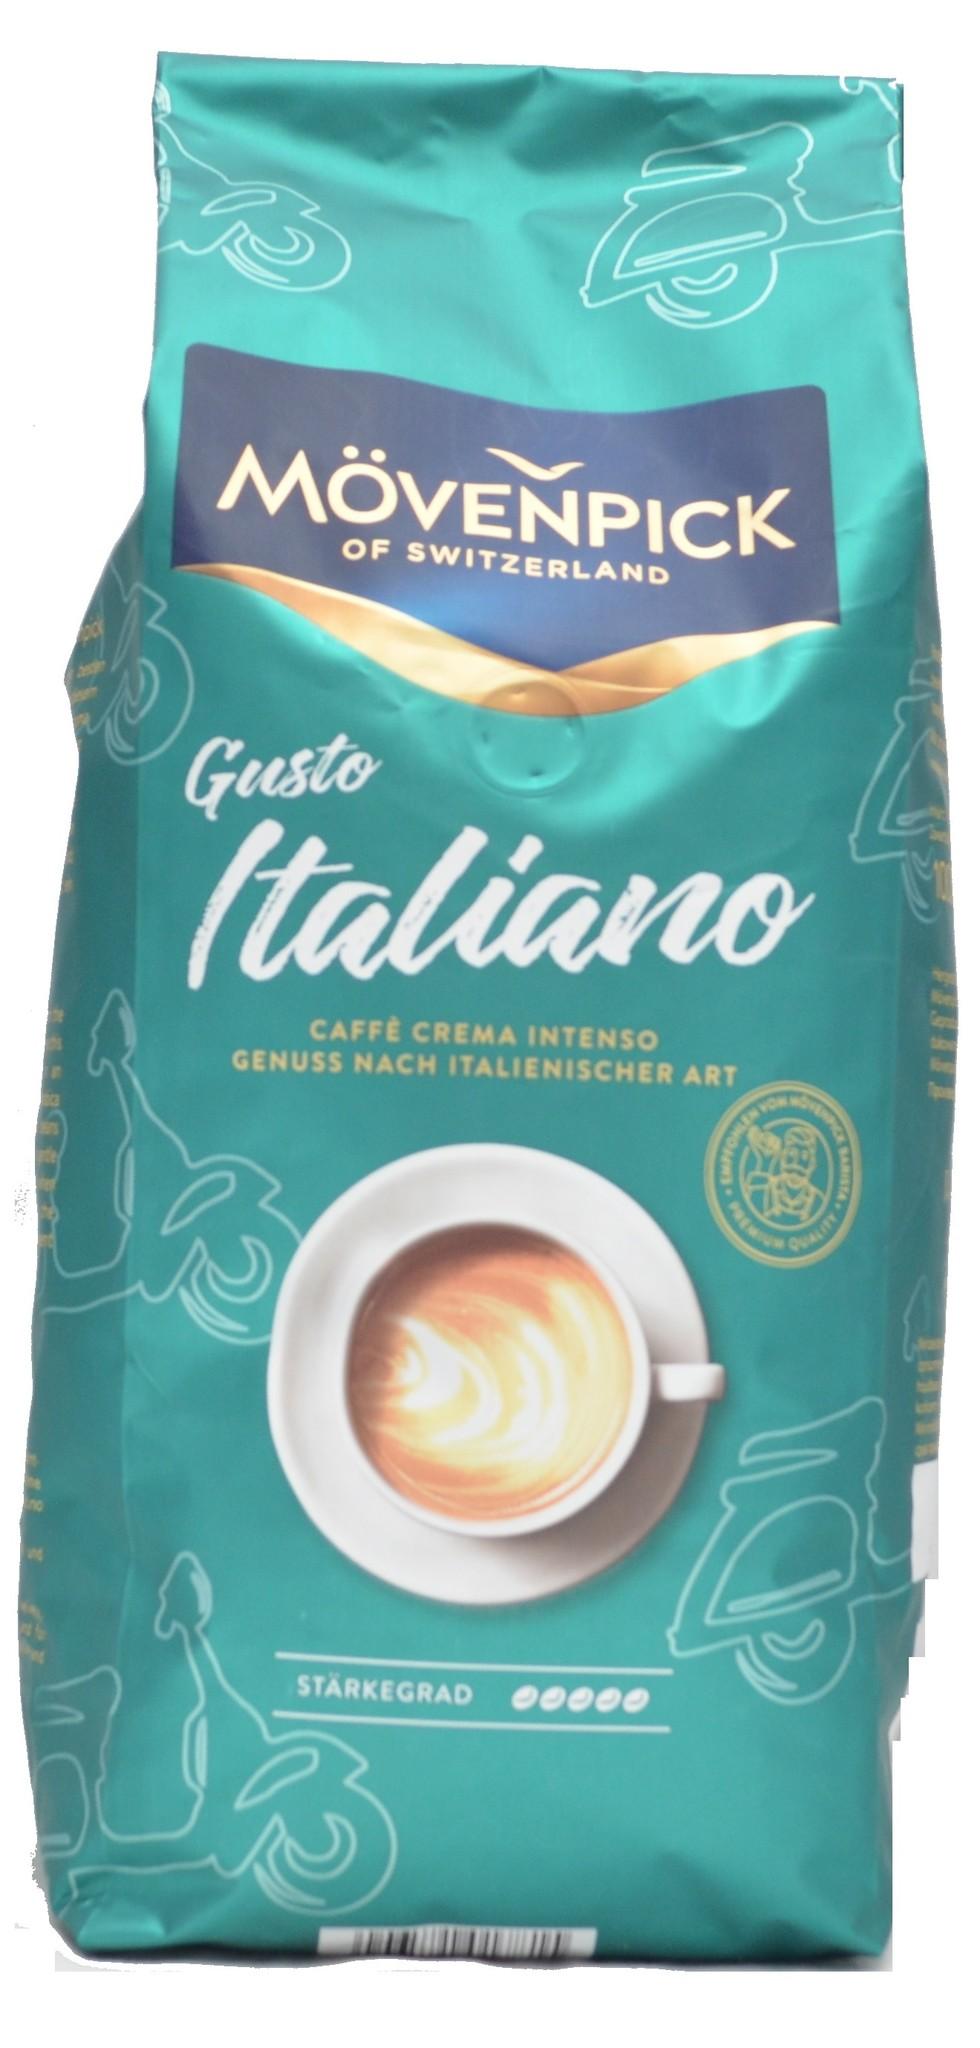 Mövenpick Caffè  Crema Gusto Italiano bonen 1 kg. nu vanaf € 7.85